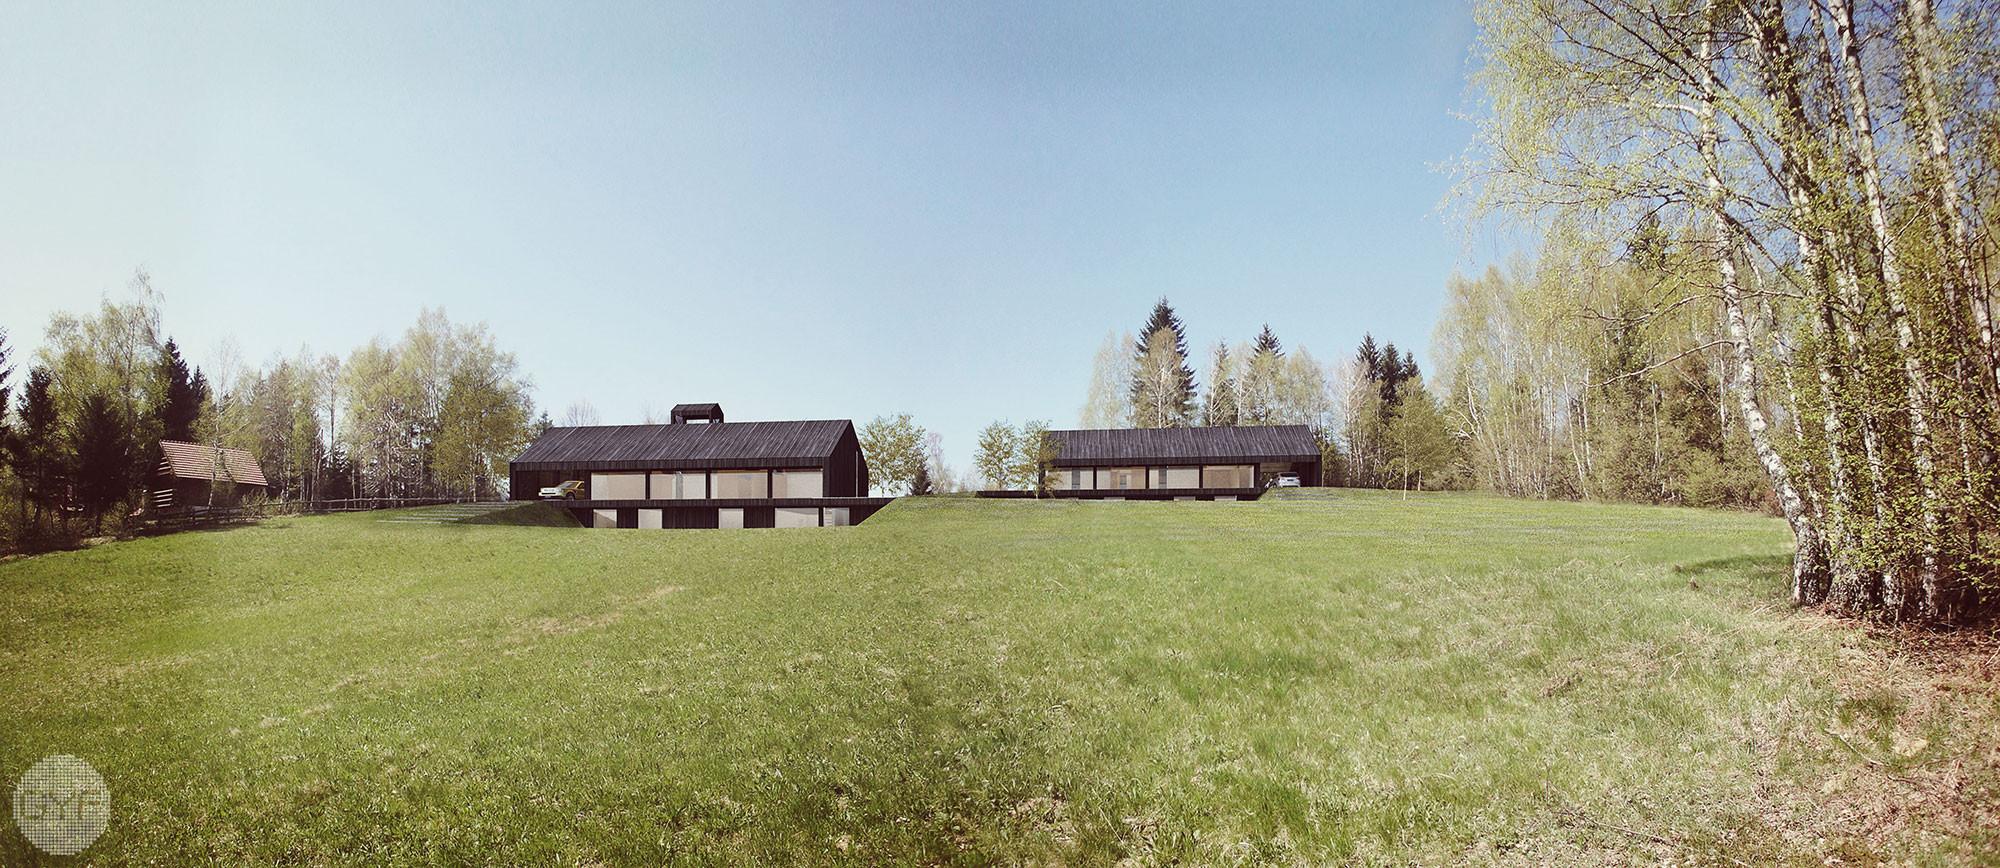 Two Single-family houses in Gorski Kotar